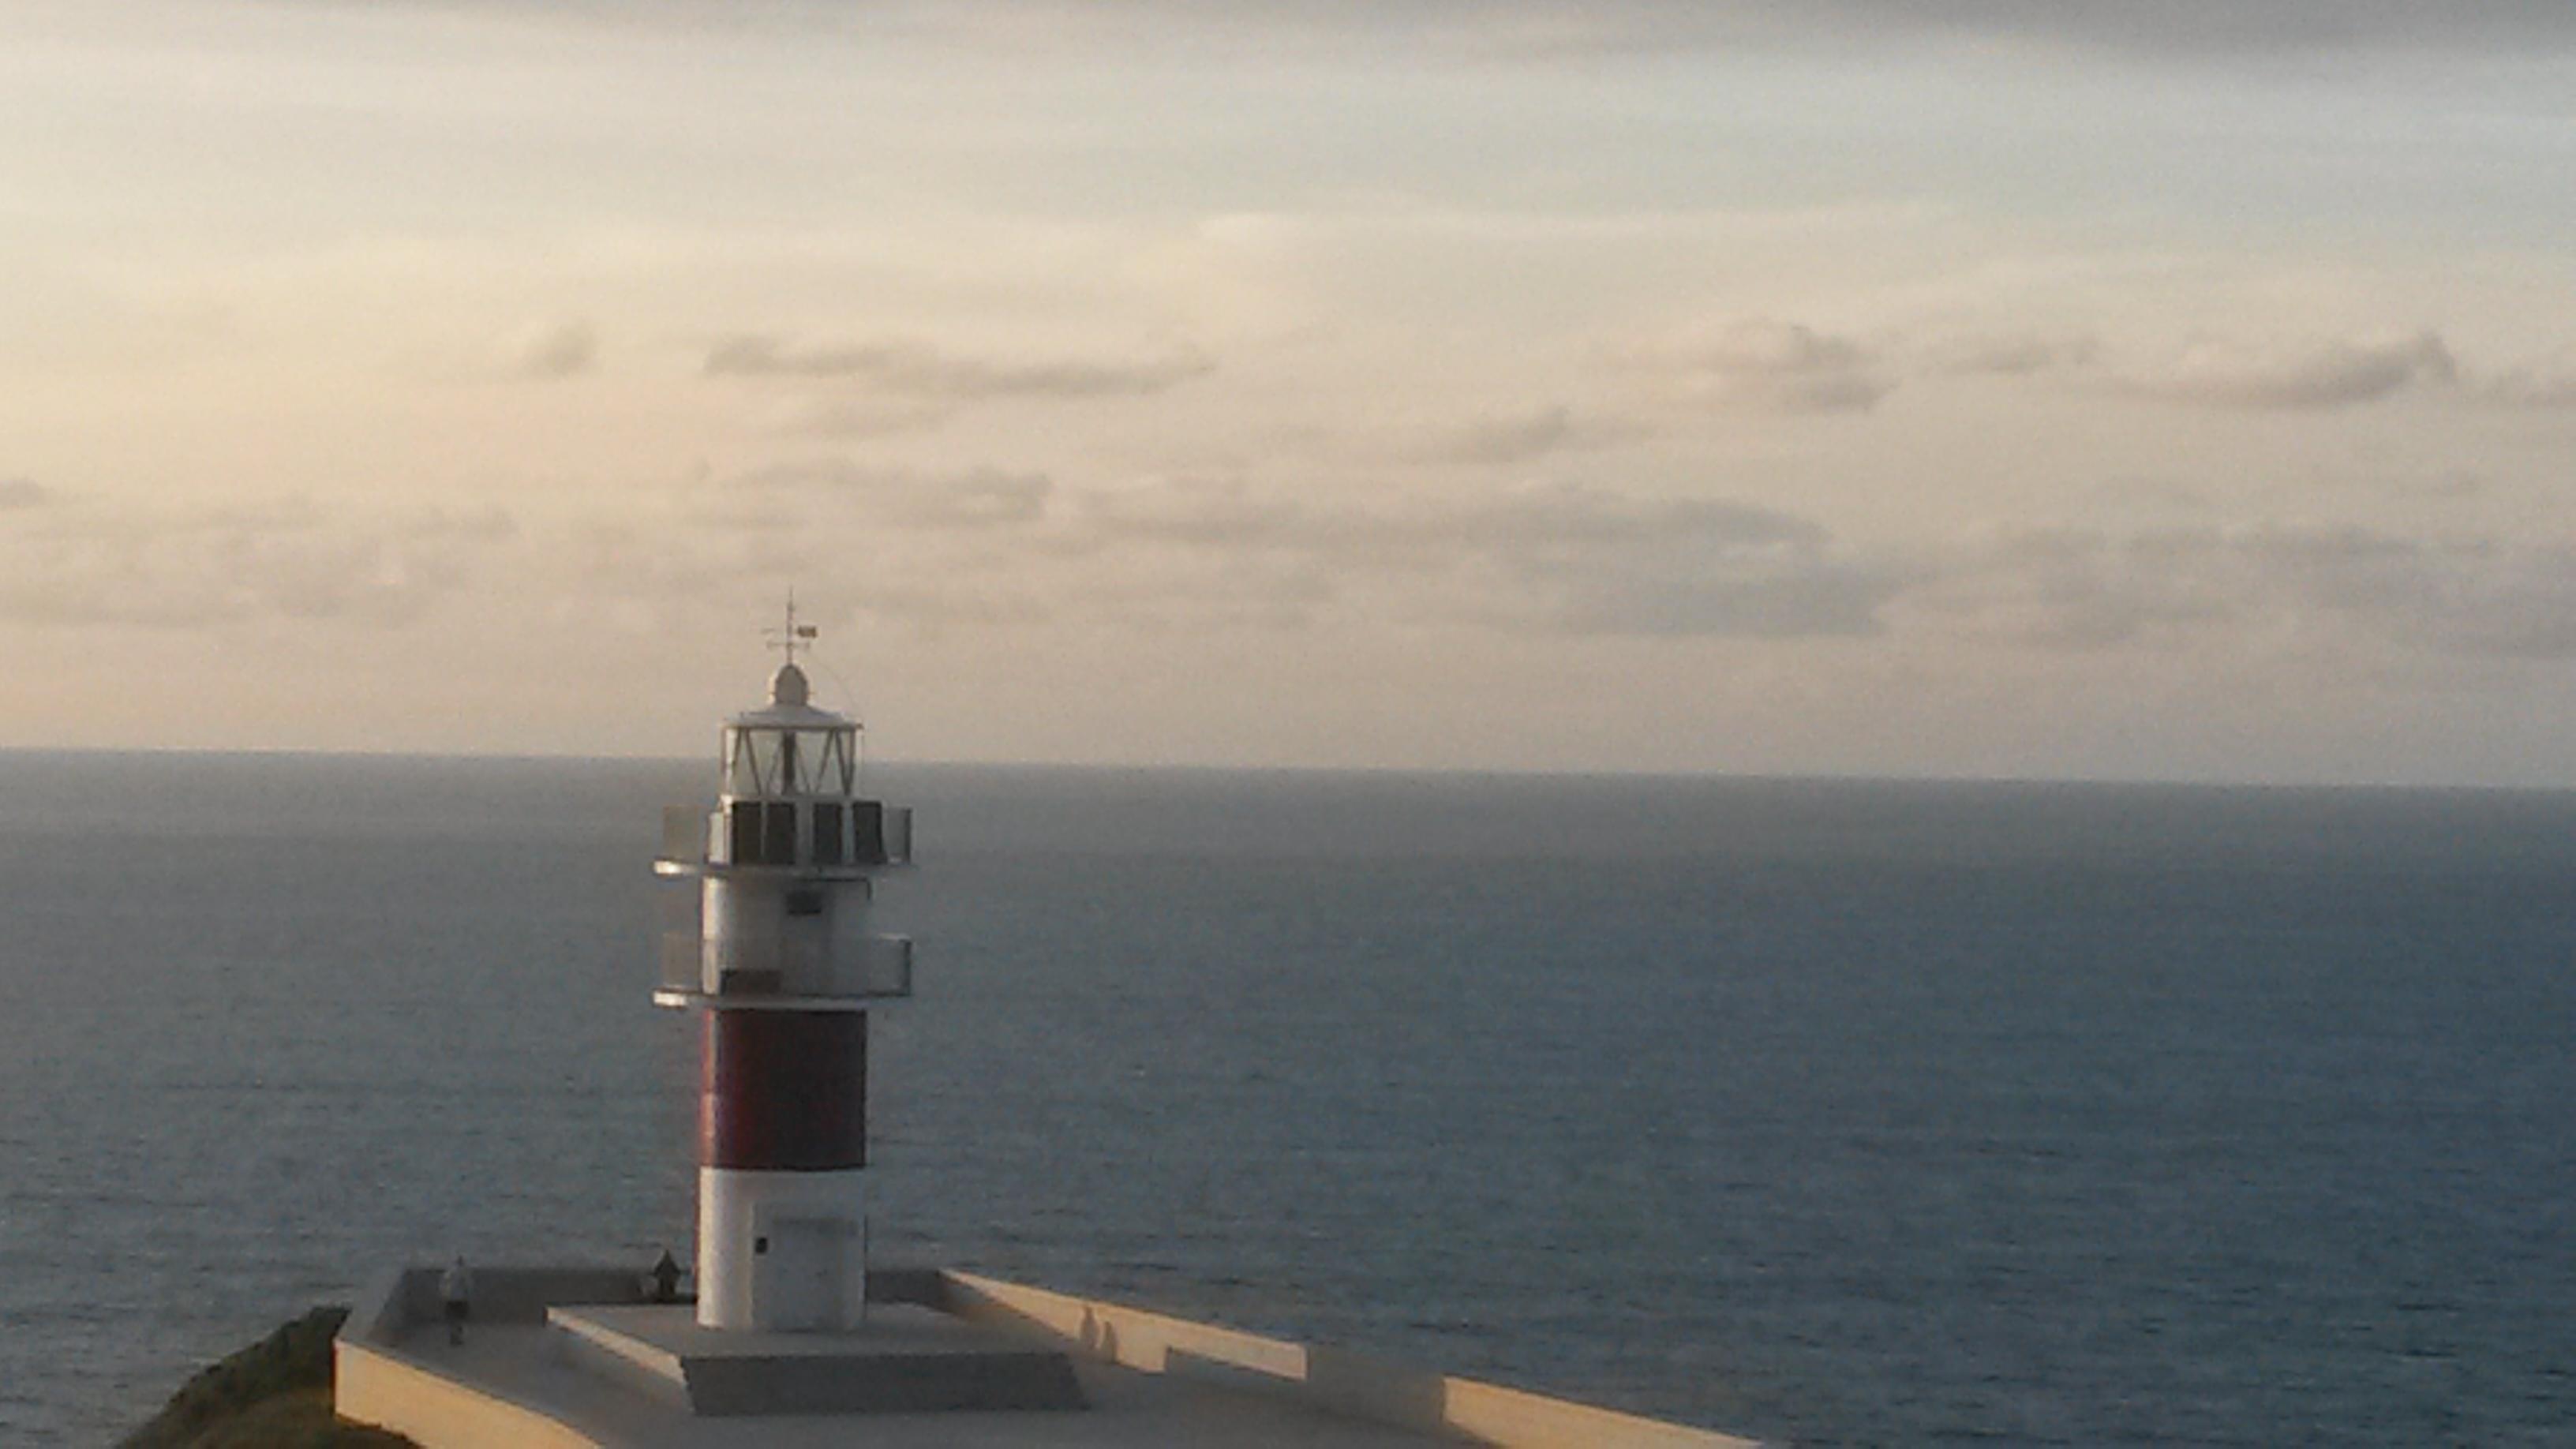 Faro mirando al mar - coaching humanista